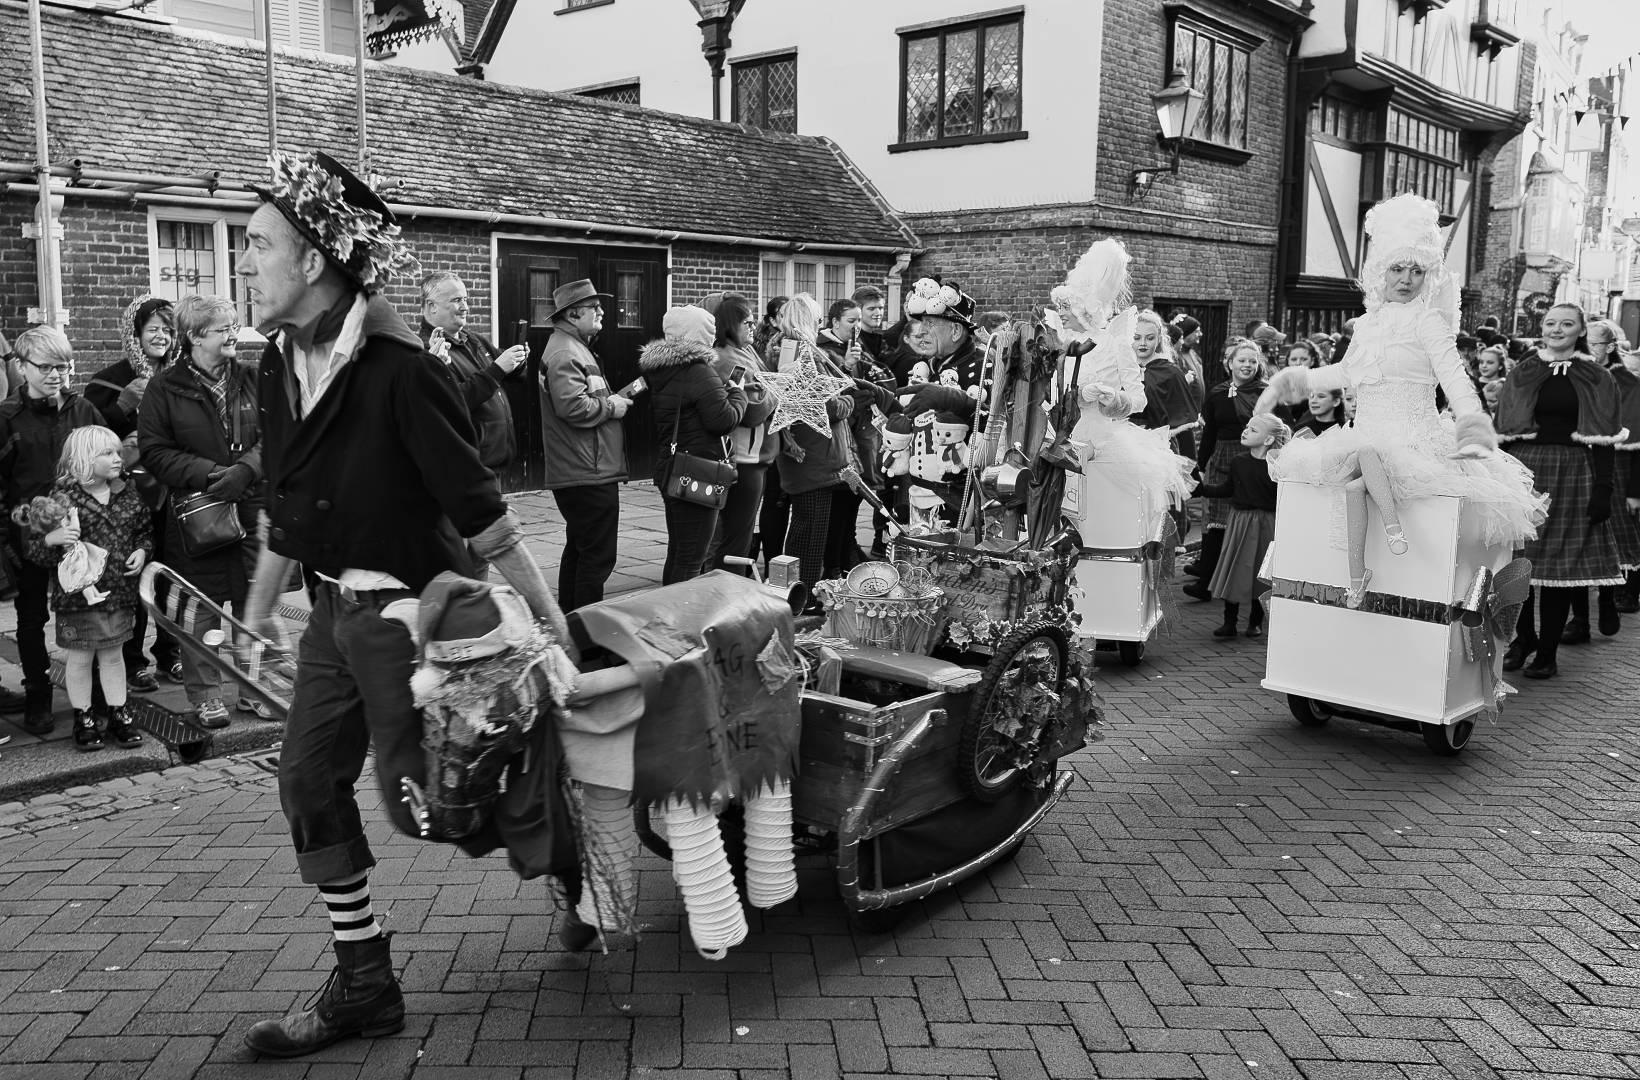 Image 16 – Rag and Bone – The Christmas Rag and Bone man, followed by Segway Fairies. Shot on Nikon Df and 24mm 1.8G